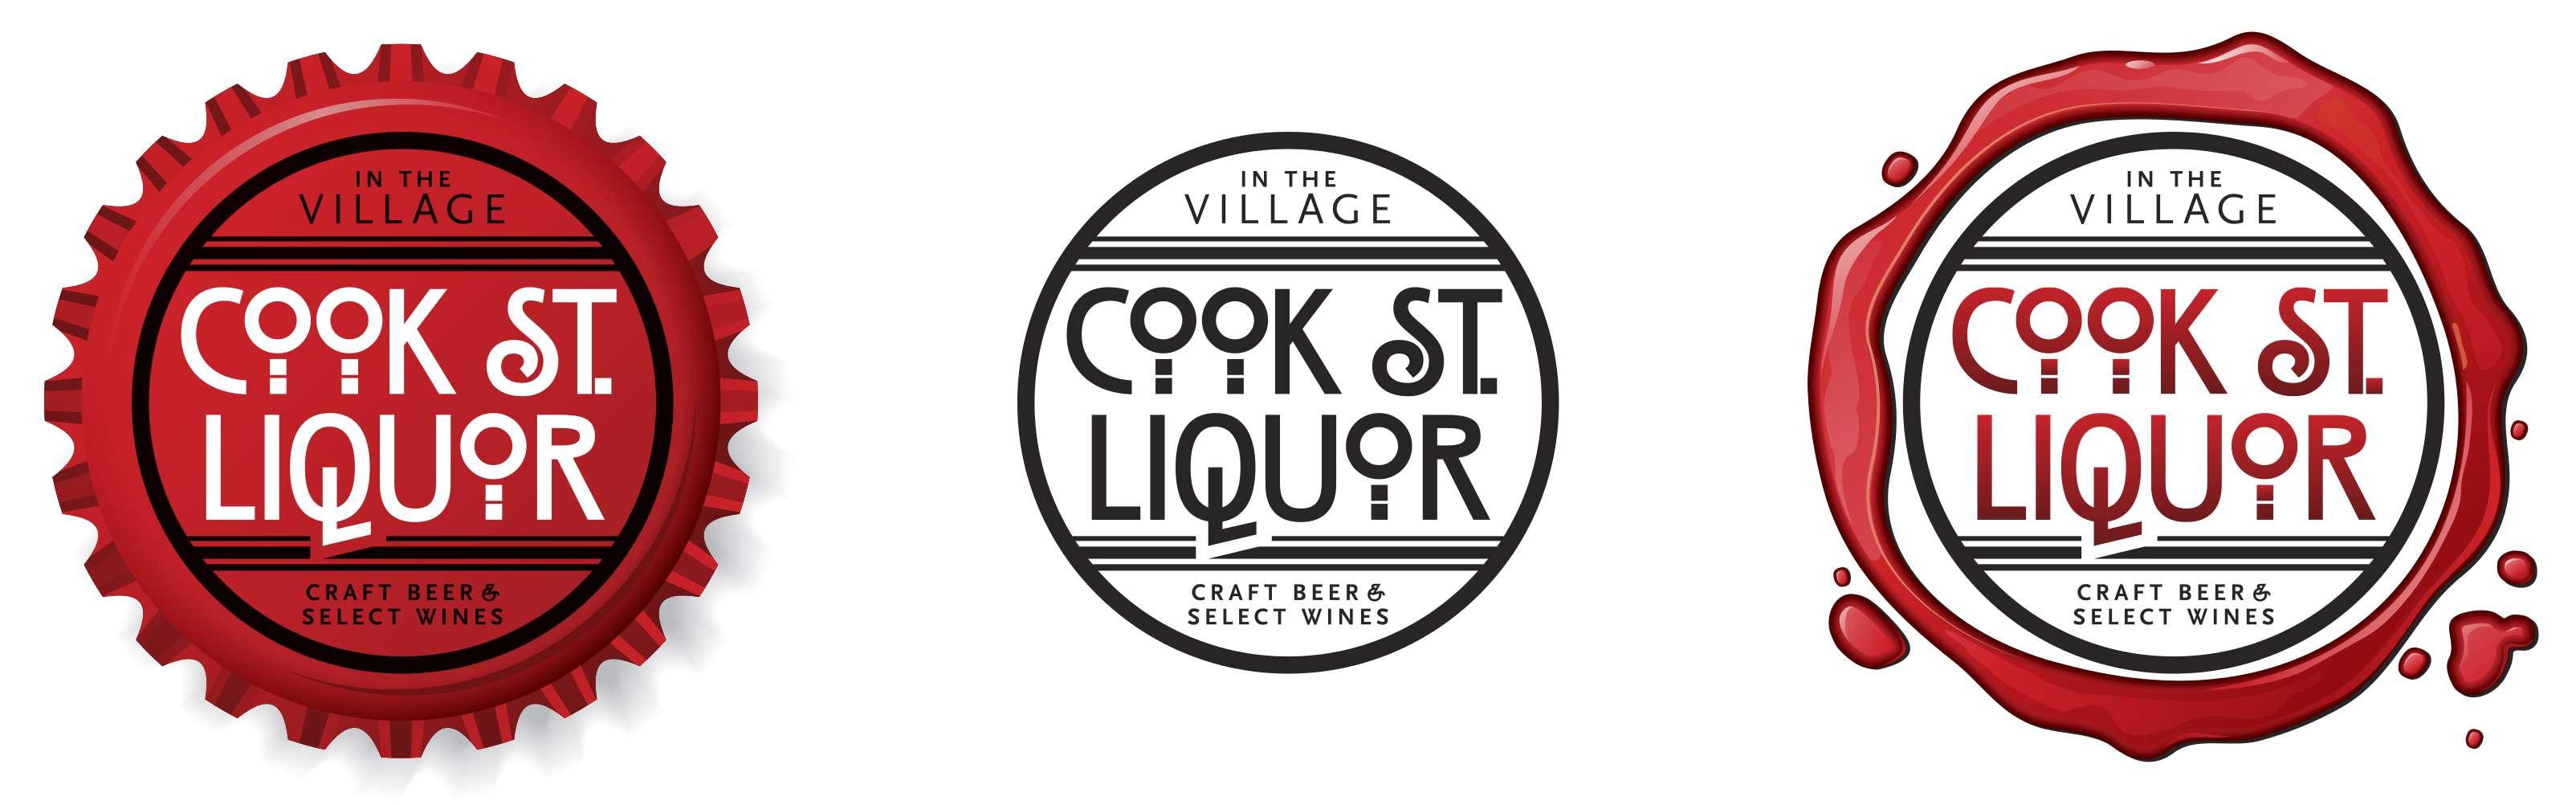 Cook Street Liquor logo family